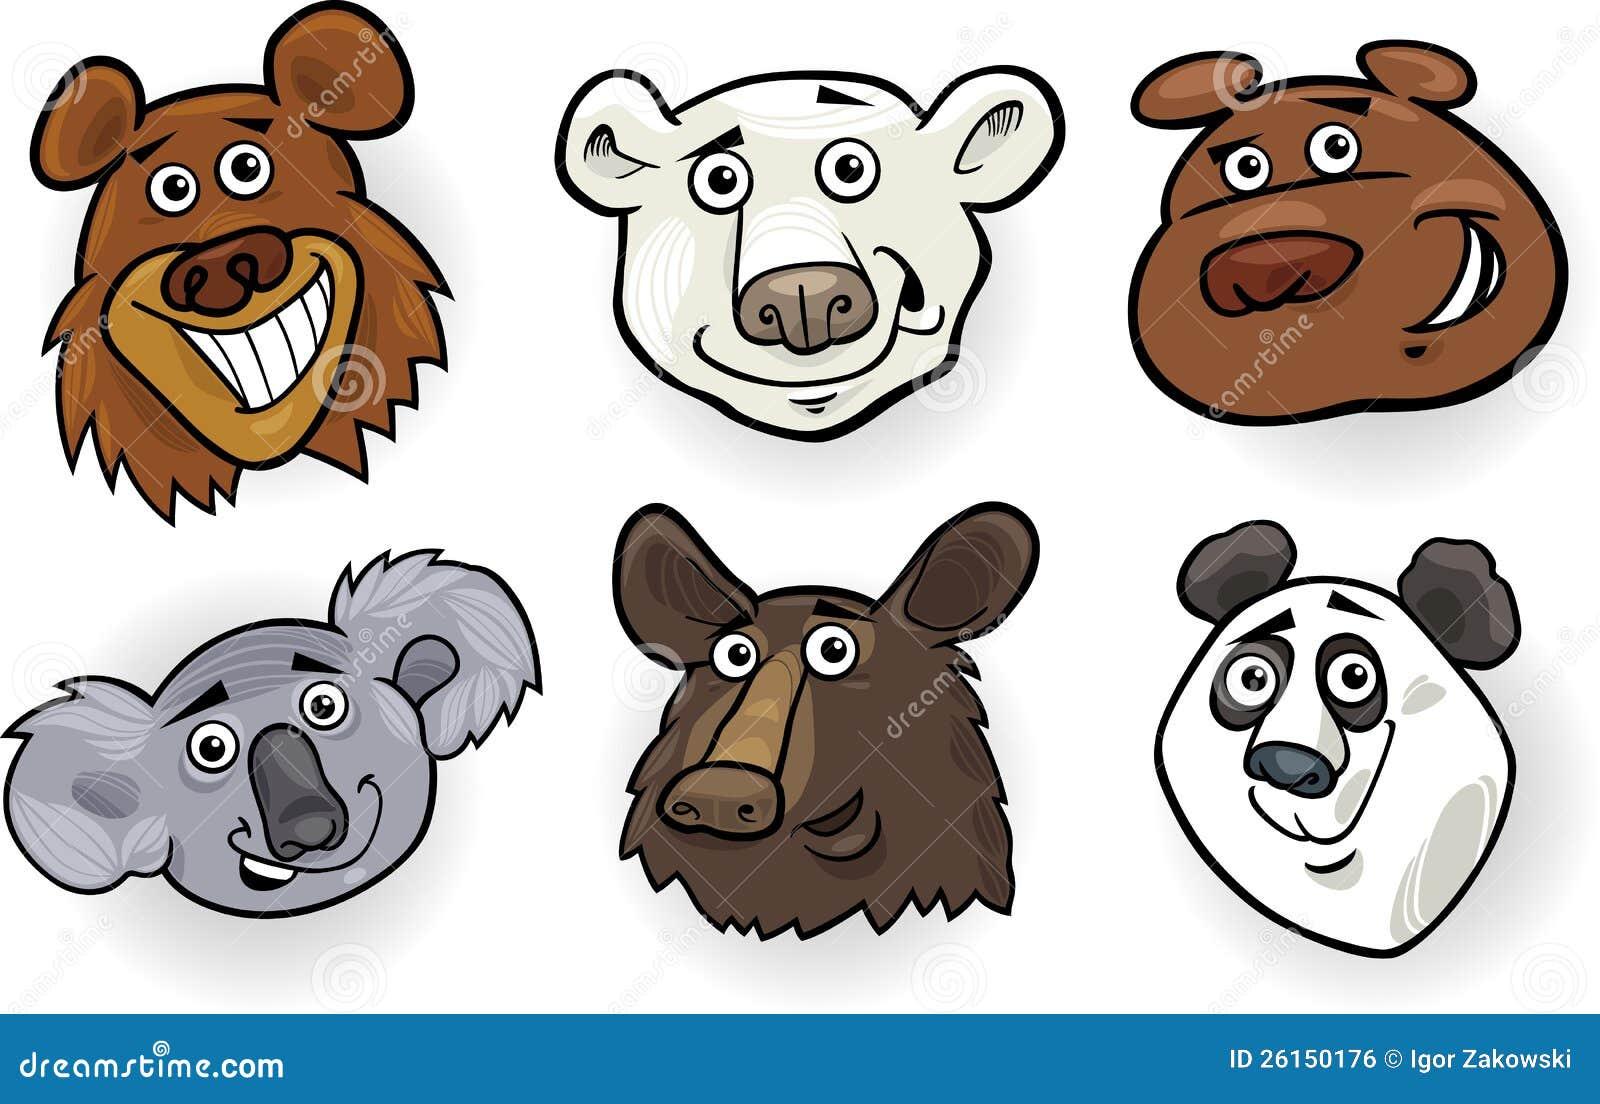 Cartoon Clipart Of Farm Animals